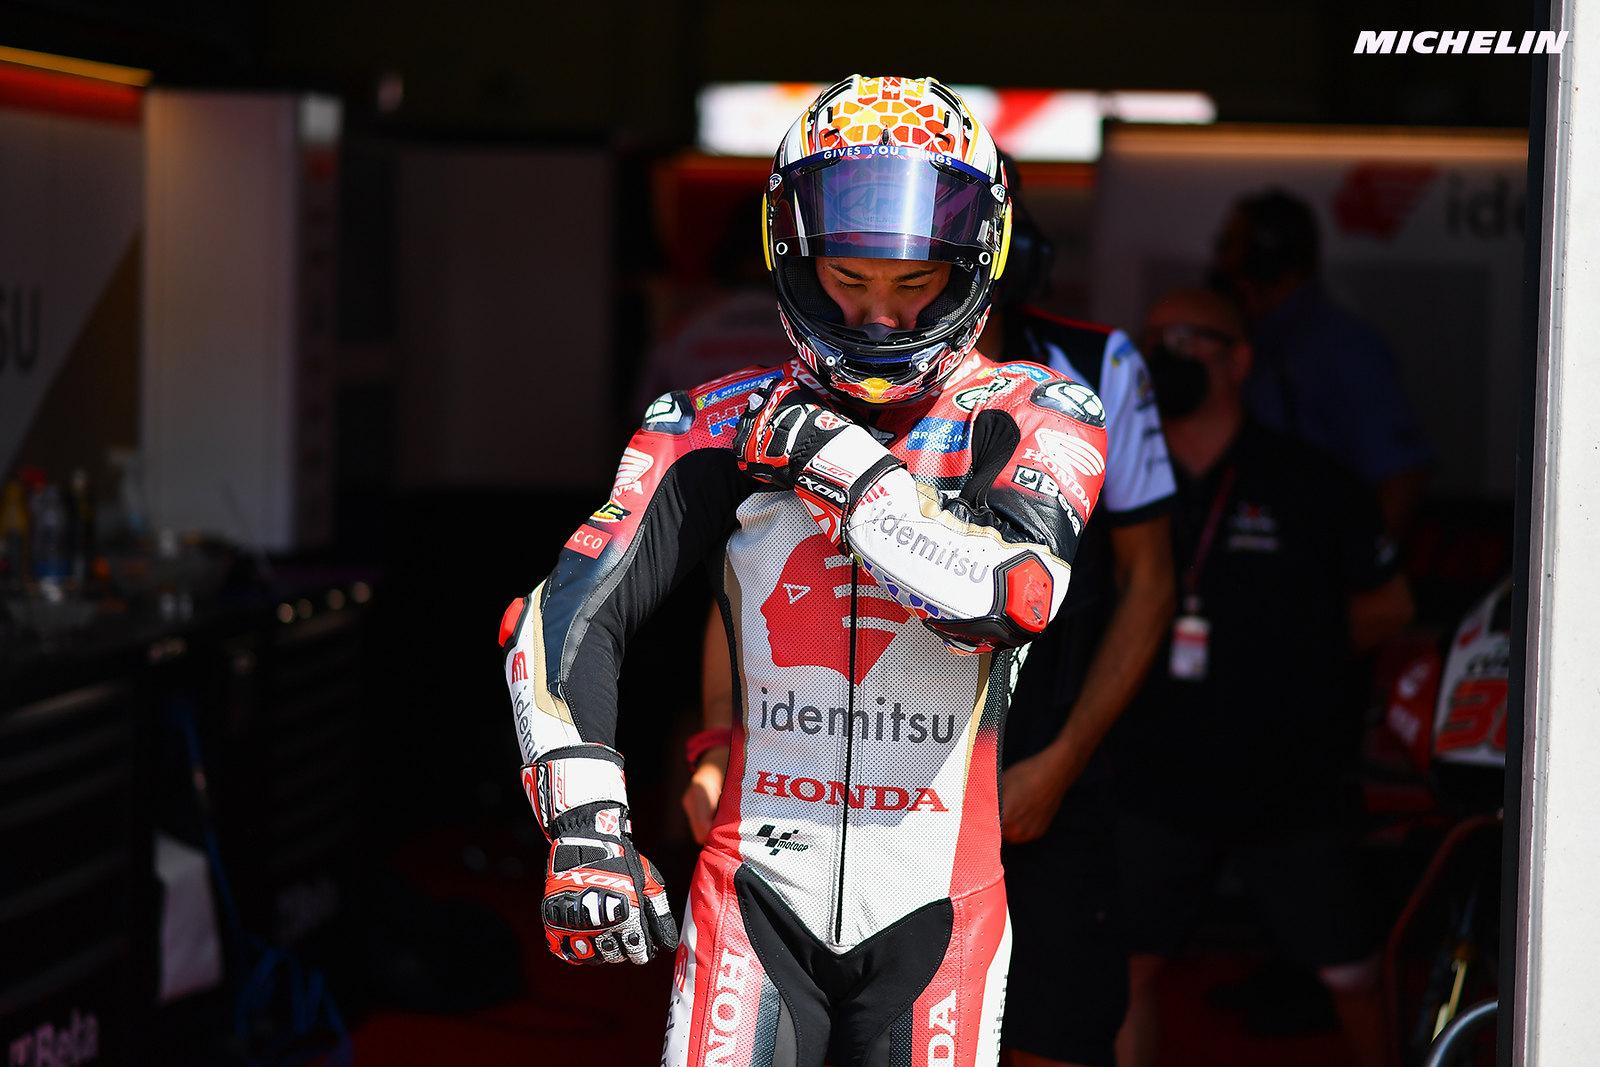 MotoGP2021オーストリアGP 初日総合 4位中上 貴晶「新しいハードフロントを使用する予定だった」